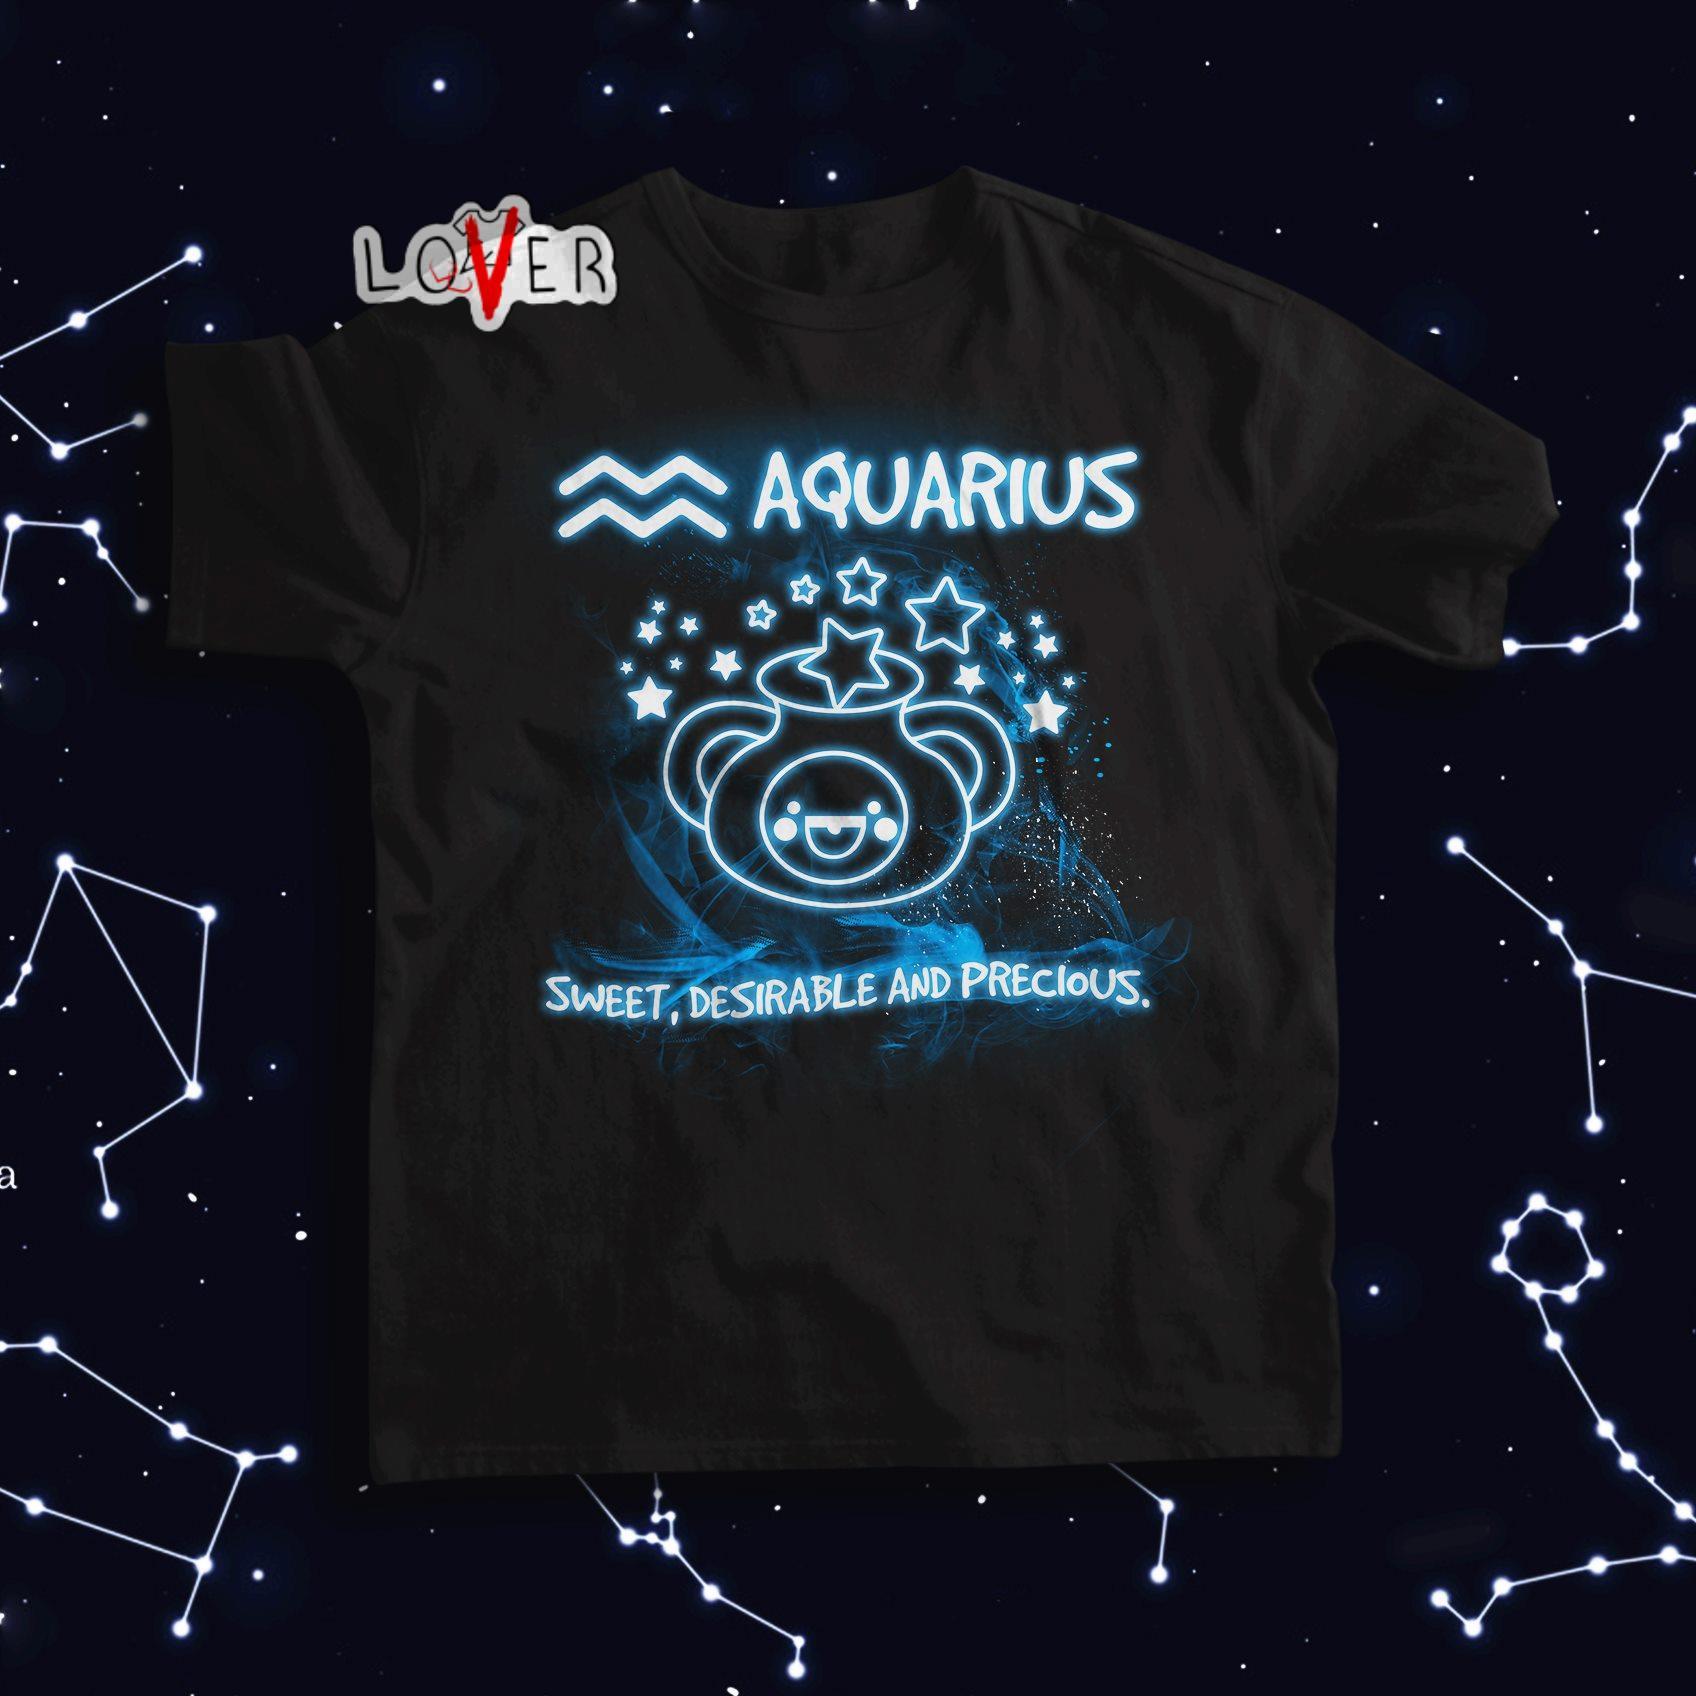 Aquarius sweet desirable and precious shirt